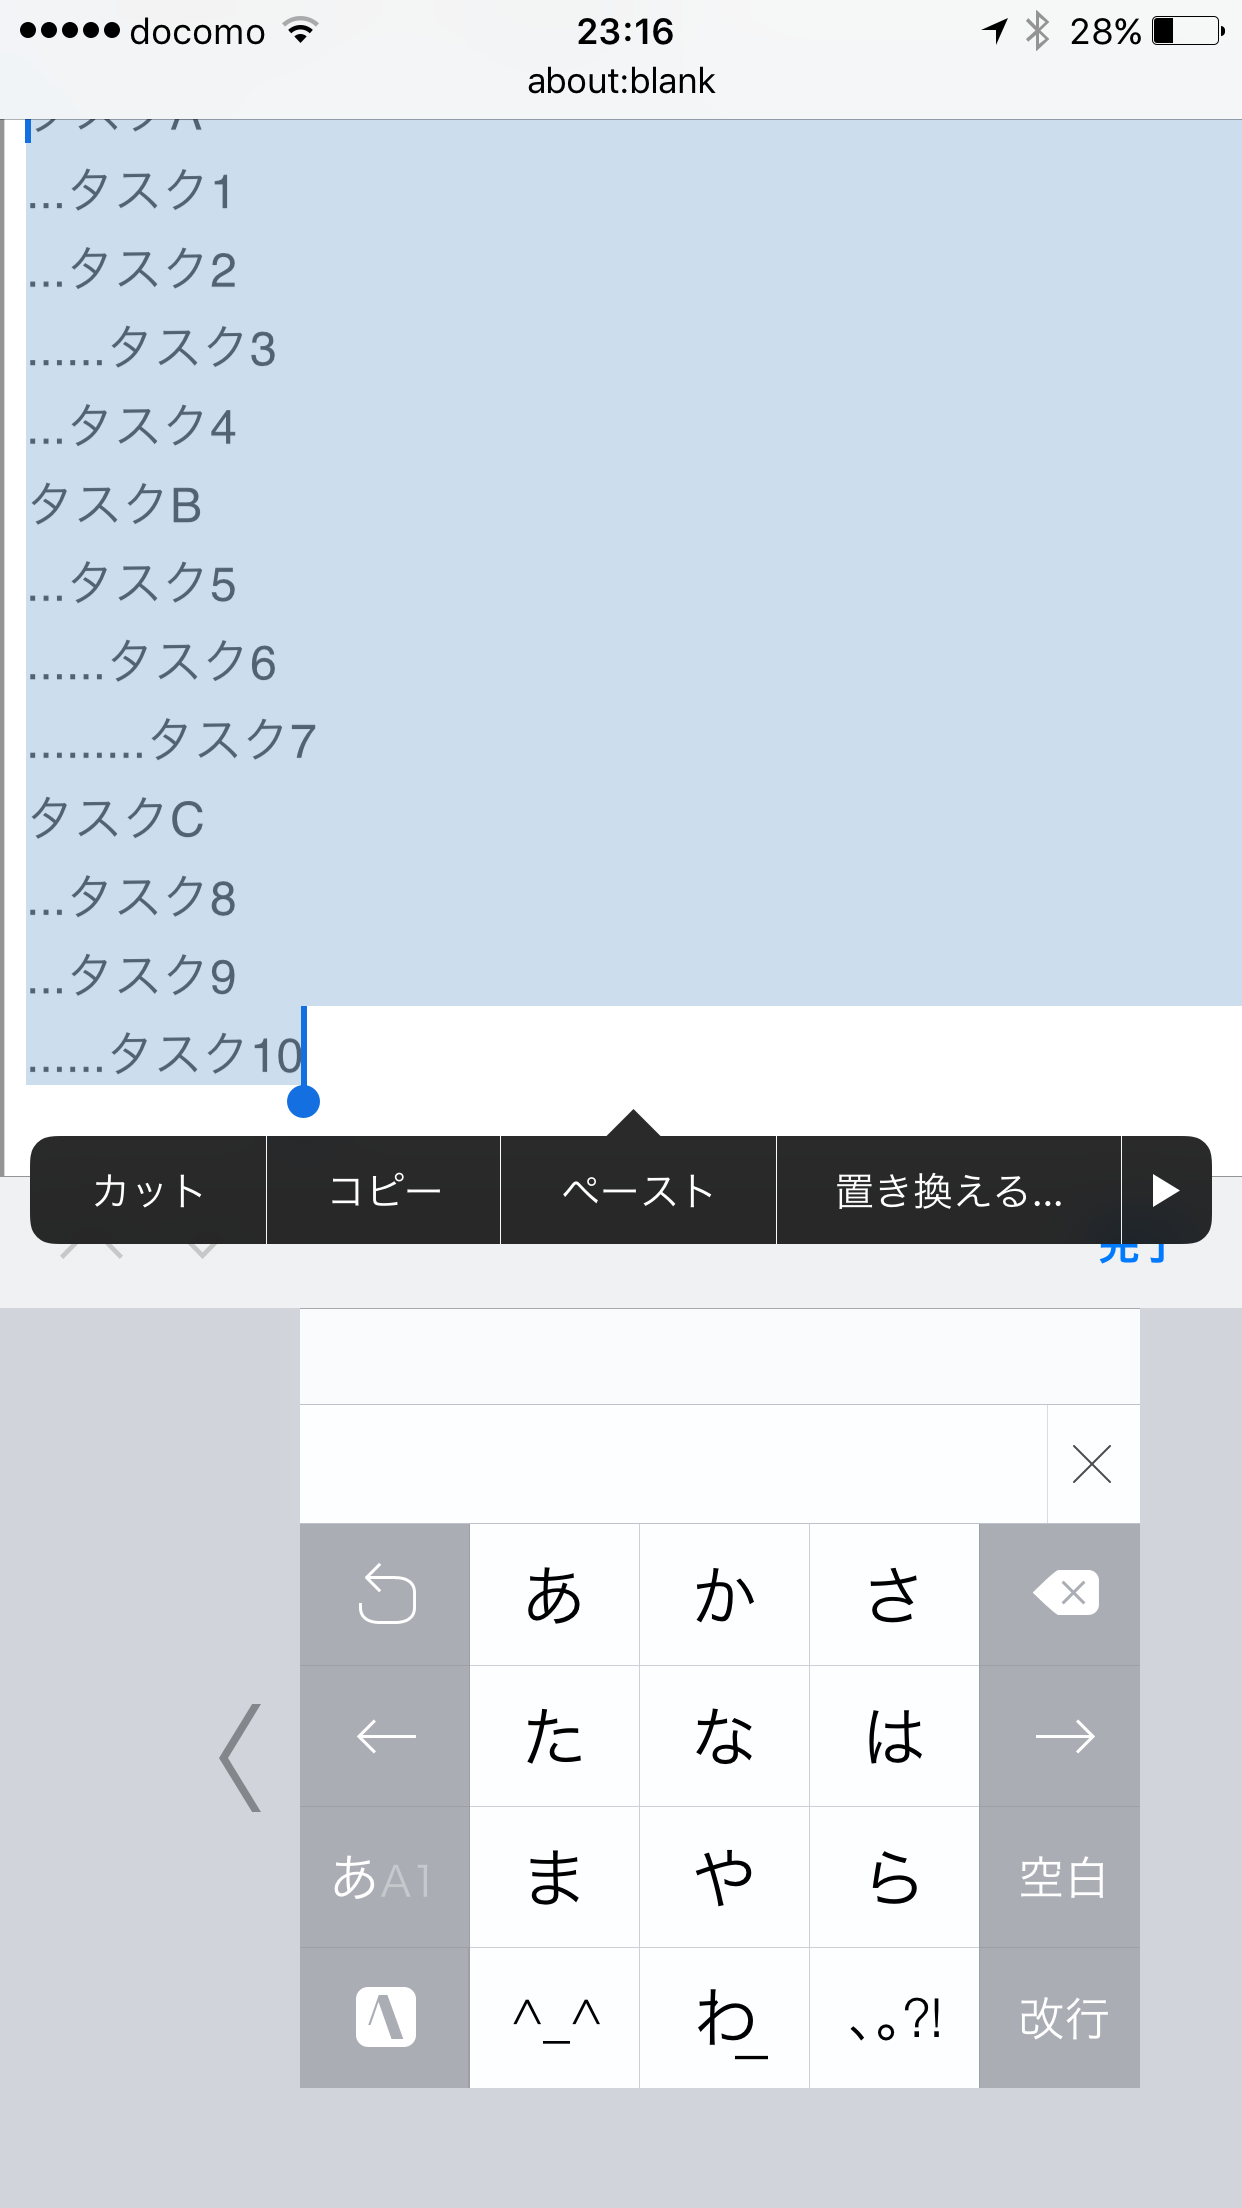 f:id:sorashima:20170331233001p:plain:w311